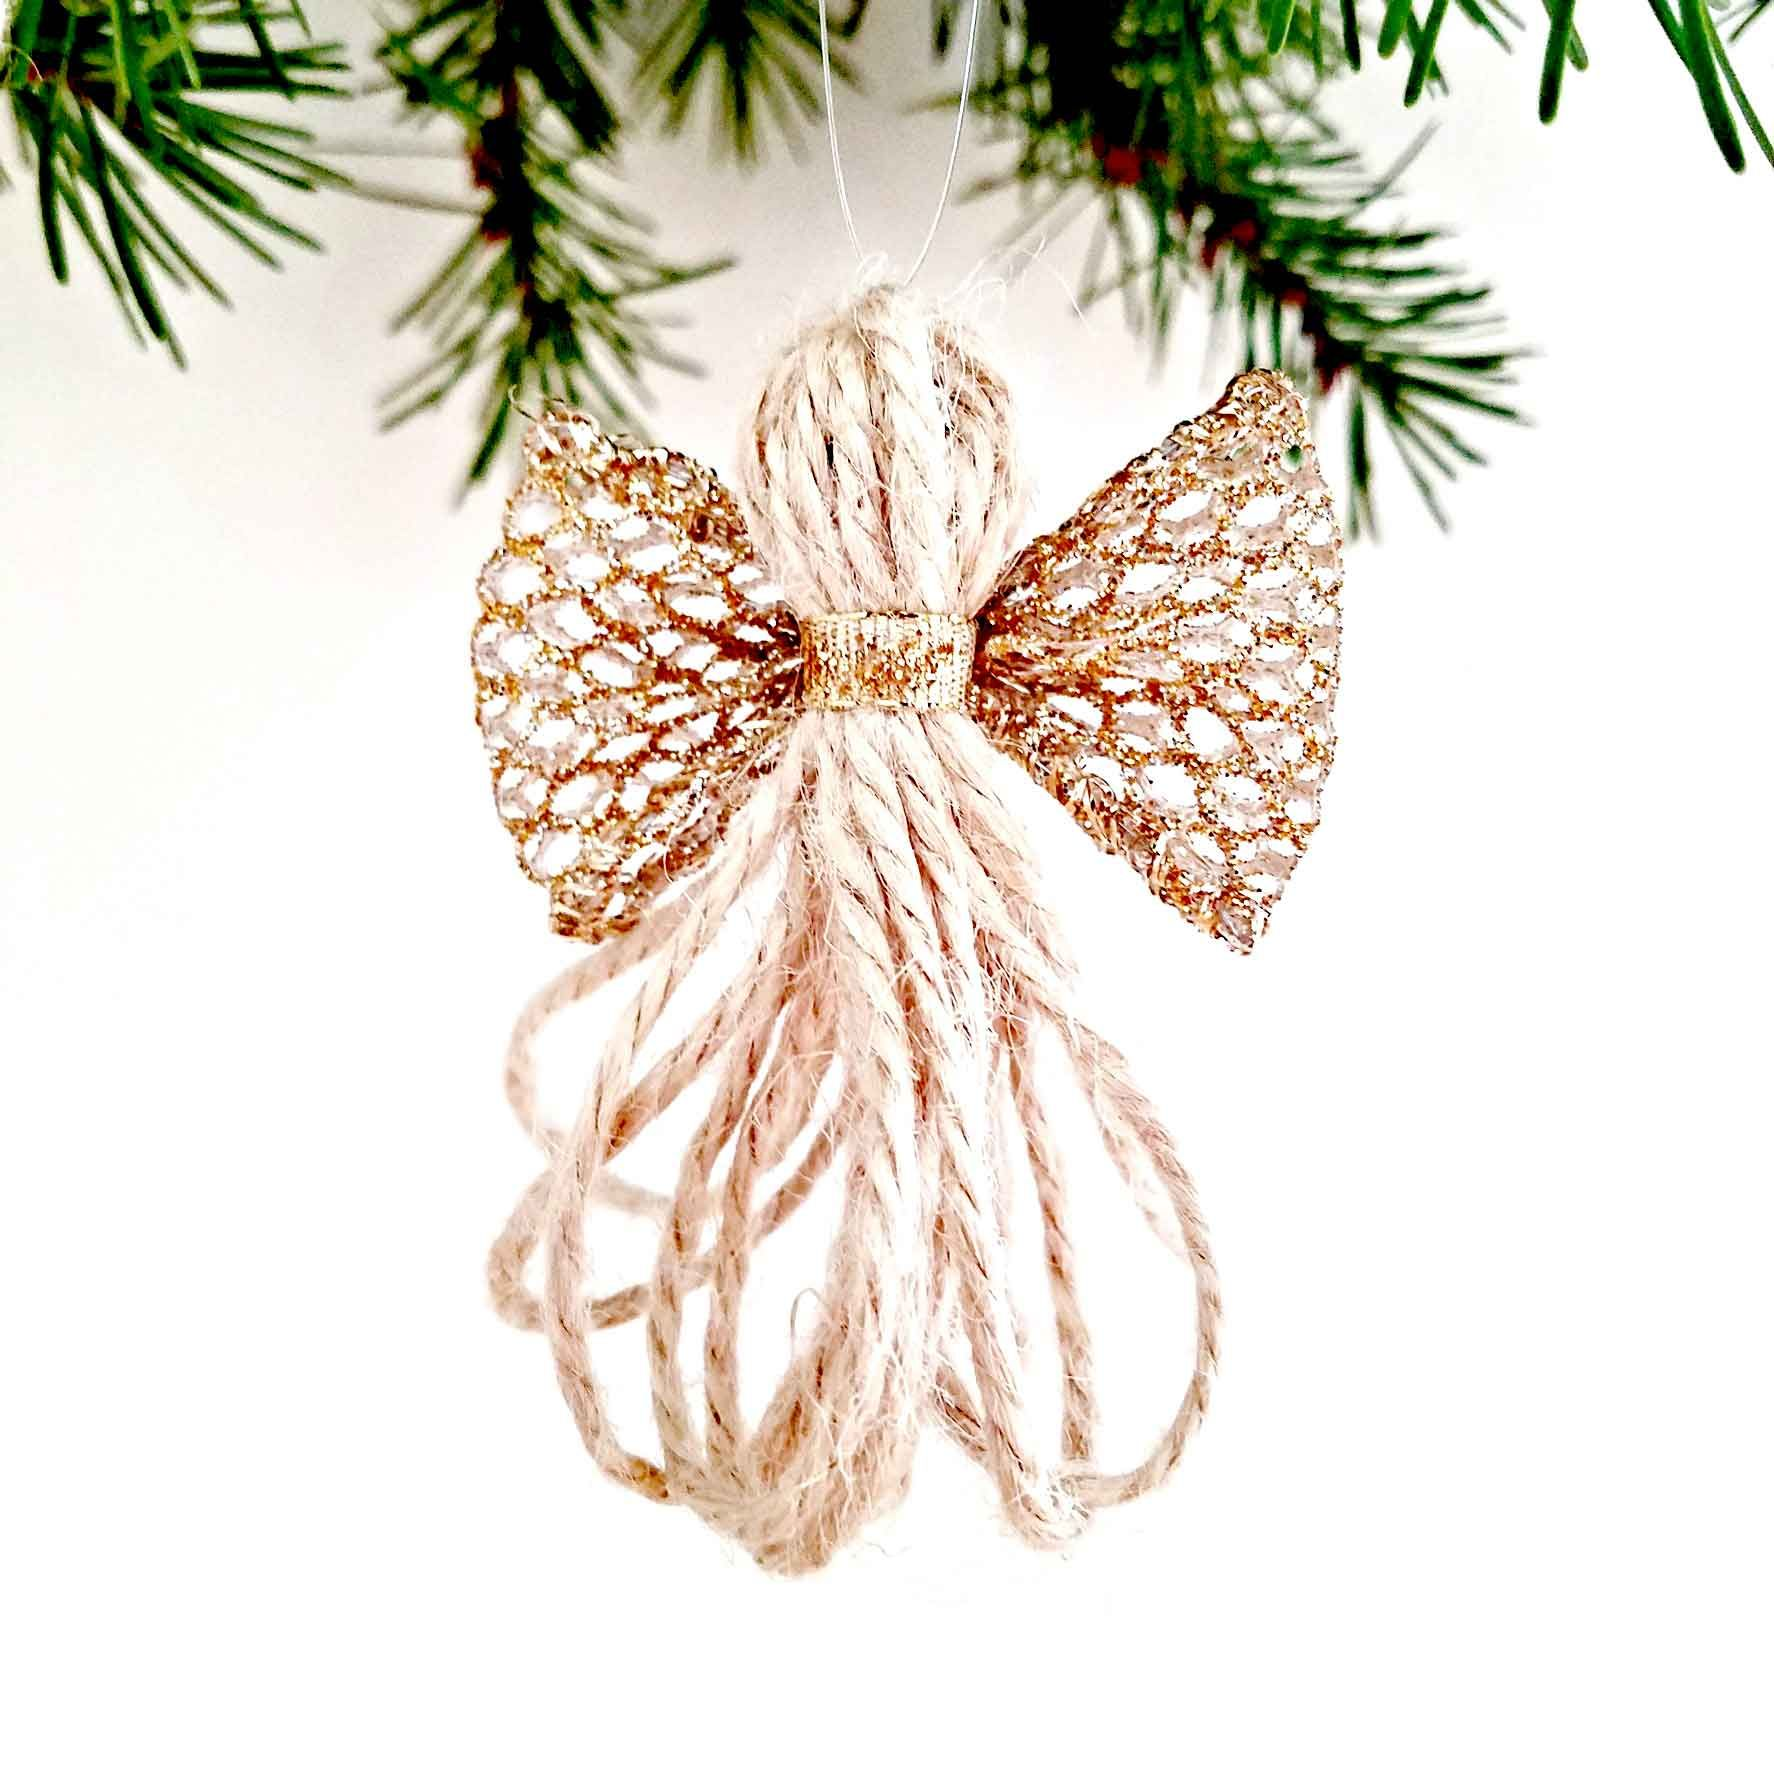 Diy Christmas Ornaments Twine Angels Mycraftchens Diy Christmas Ornaments Easy Diy Christmas Ornaments Easy Christmas Diy